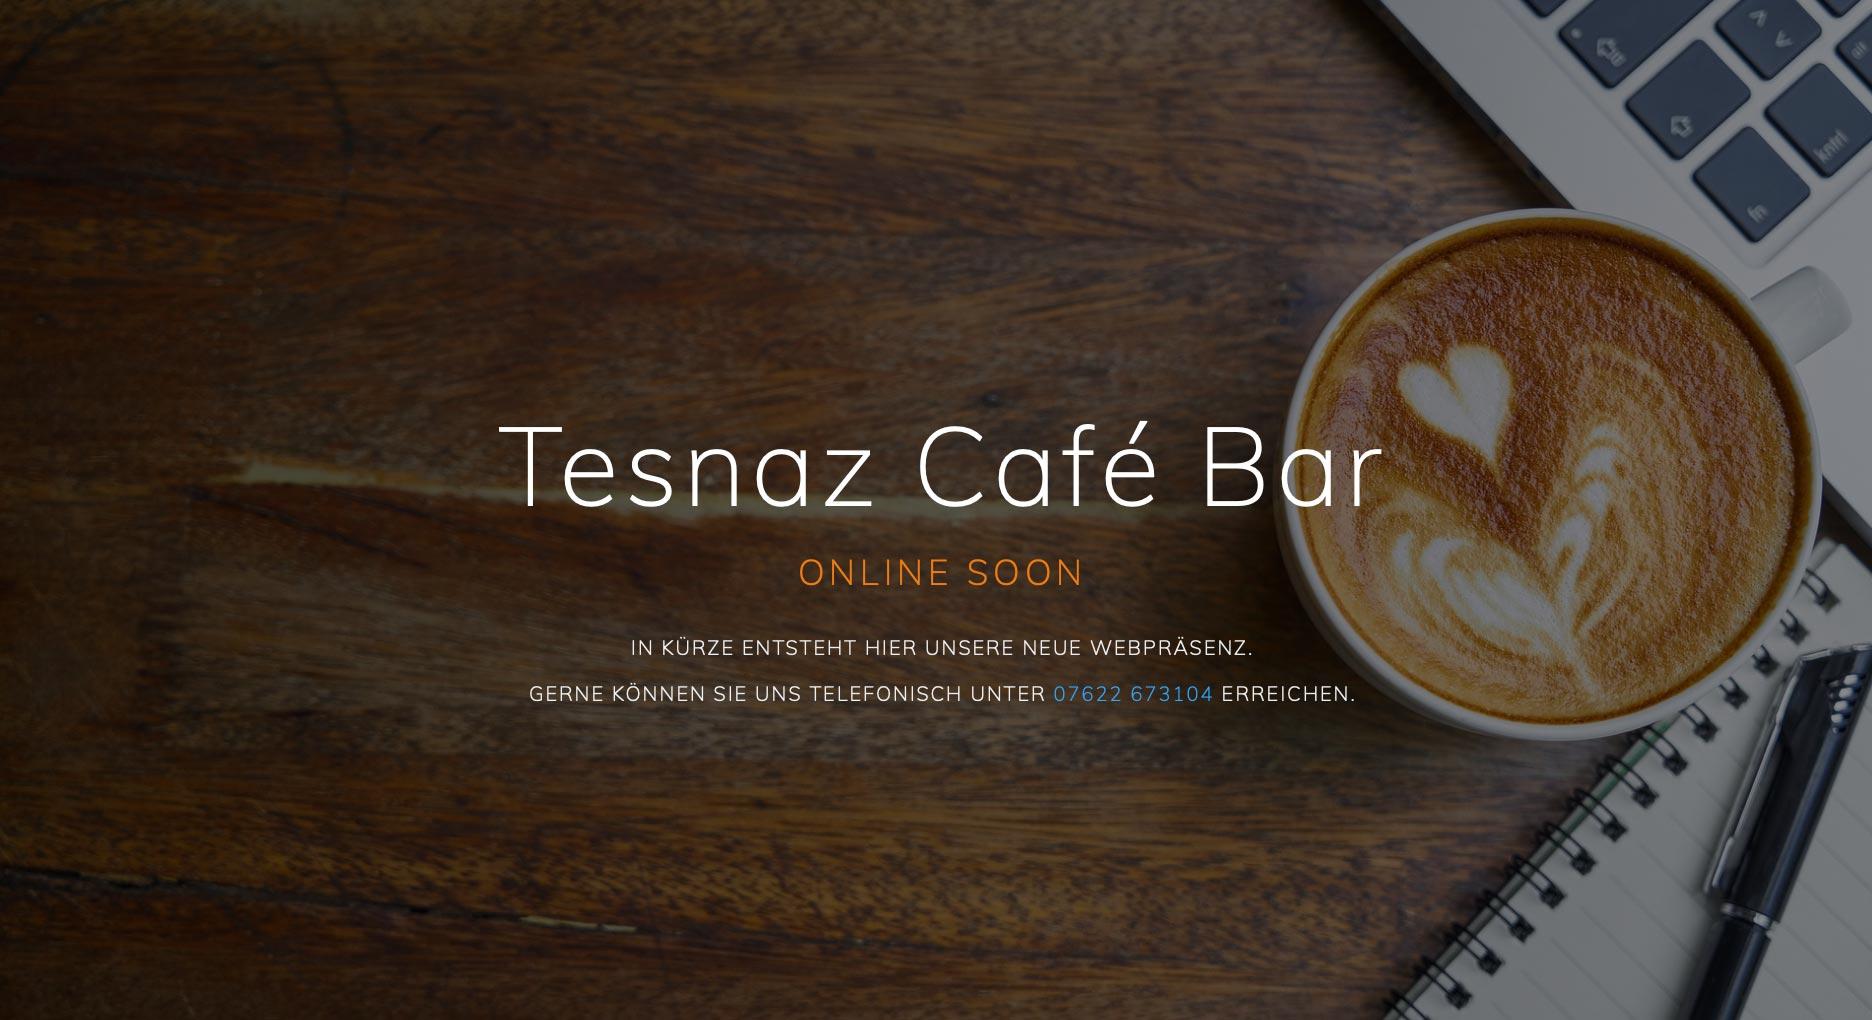 Tesnaz Café Bar Website